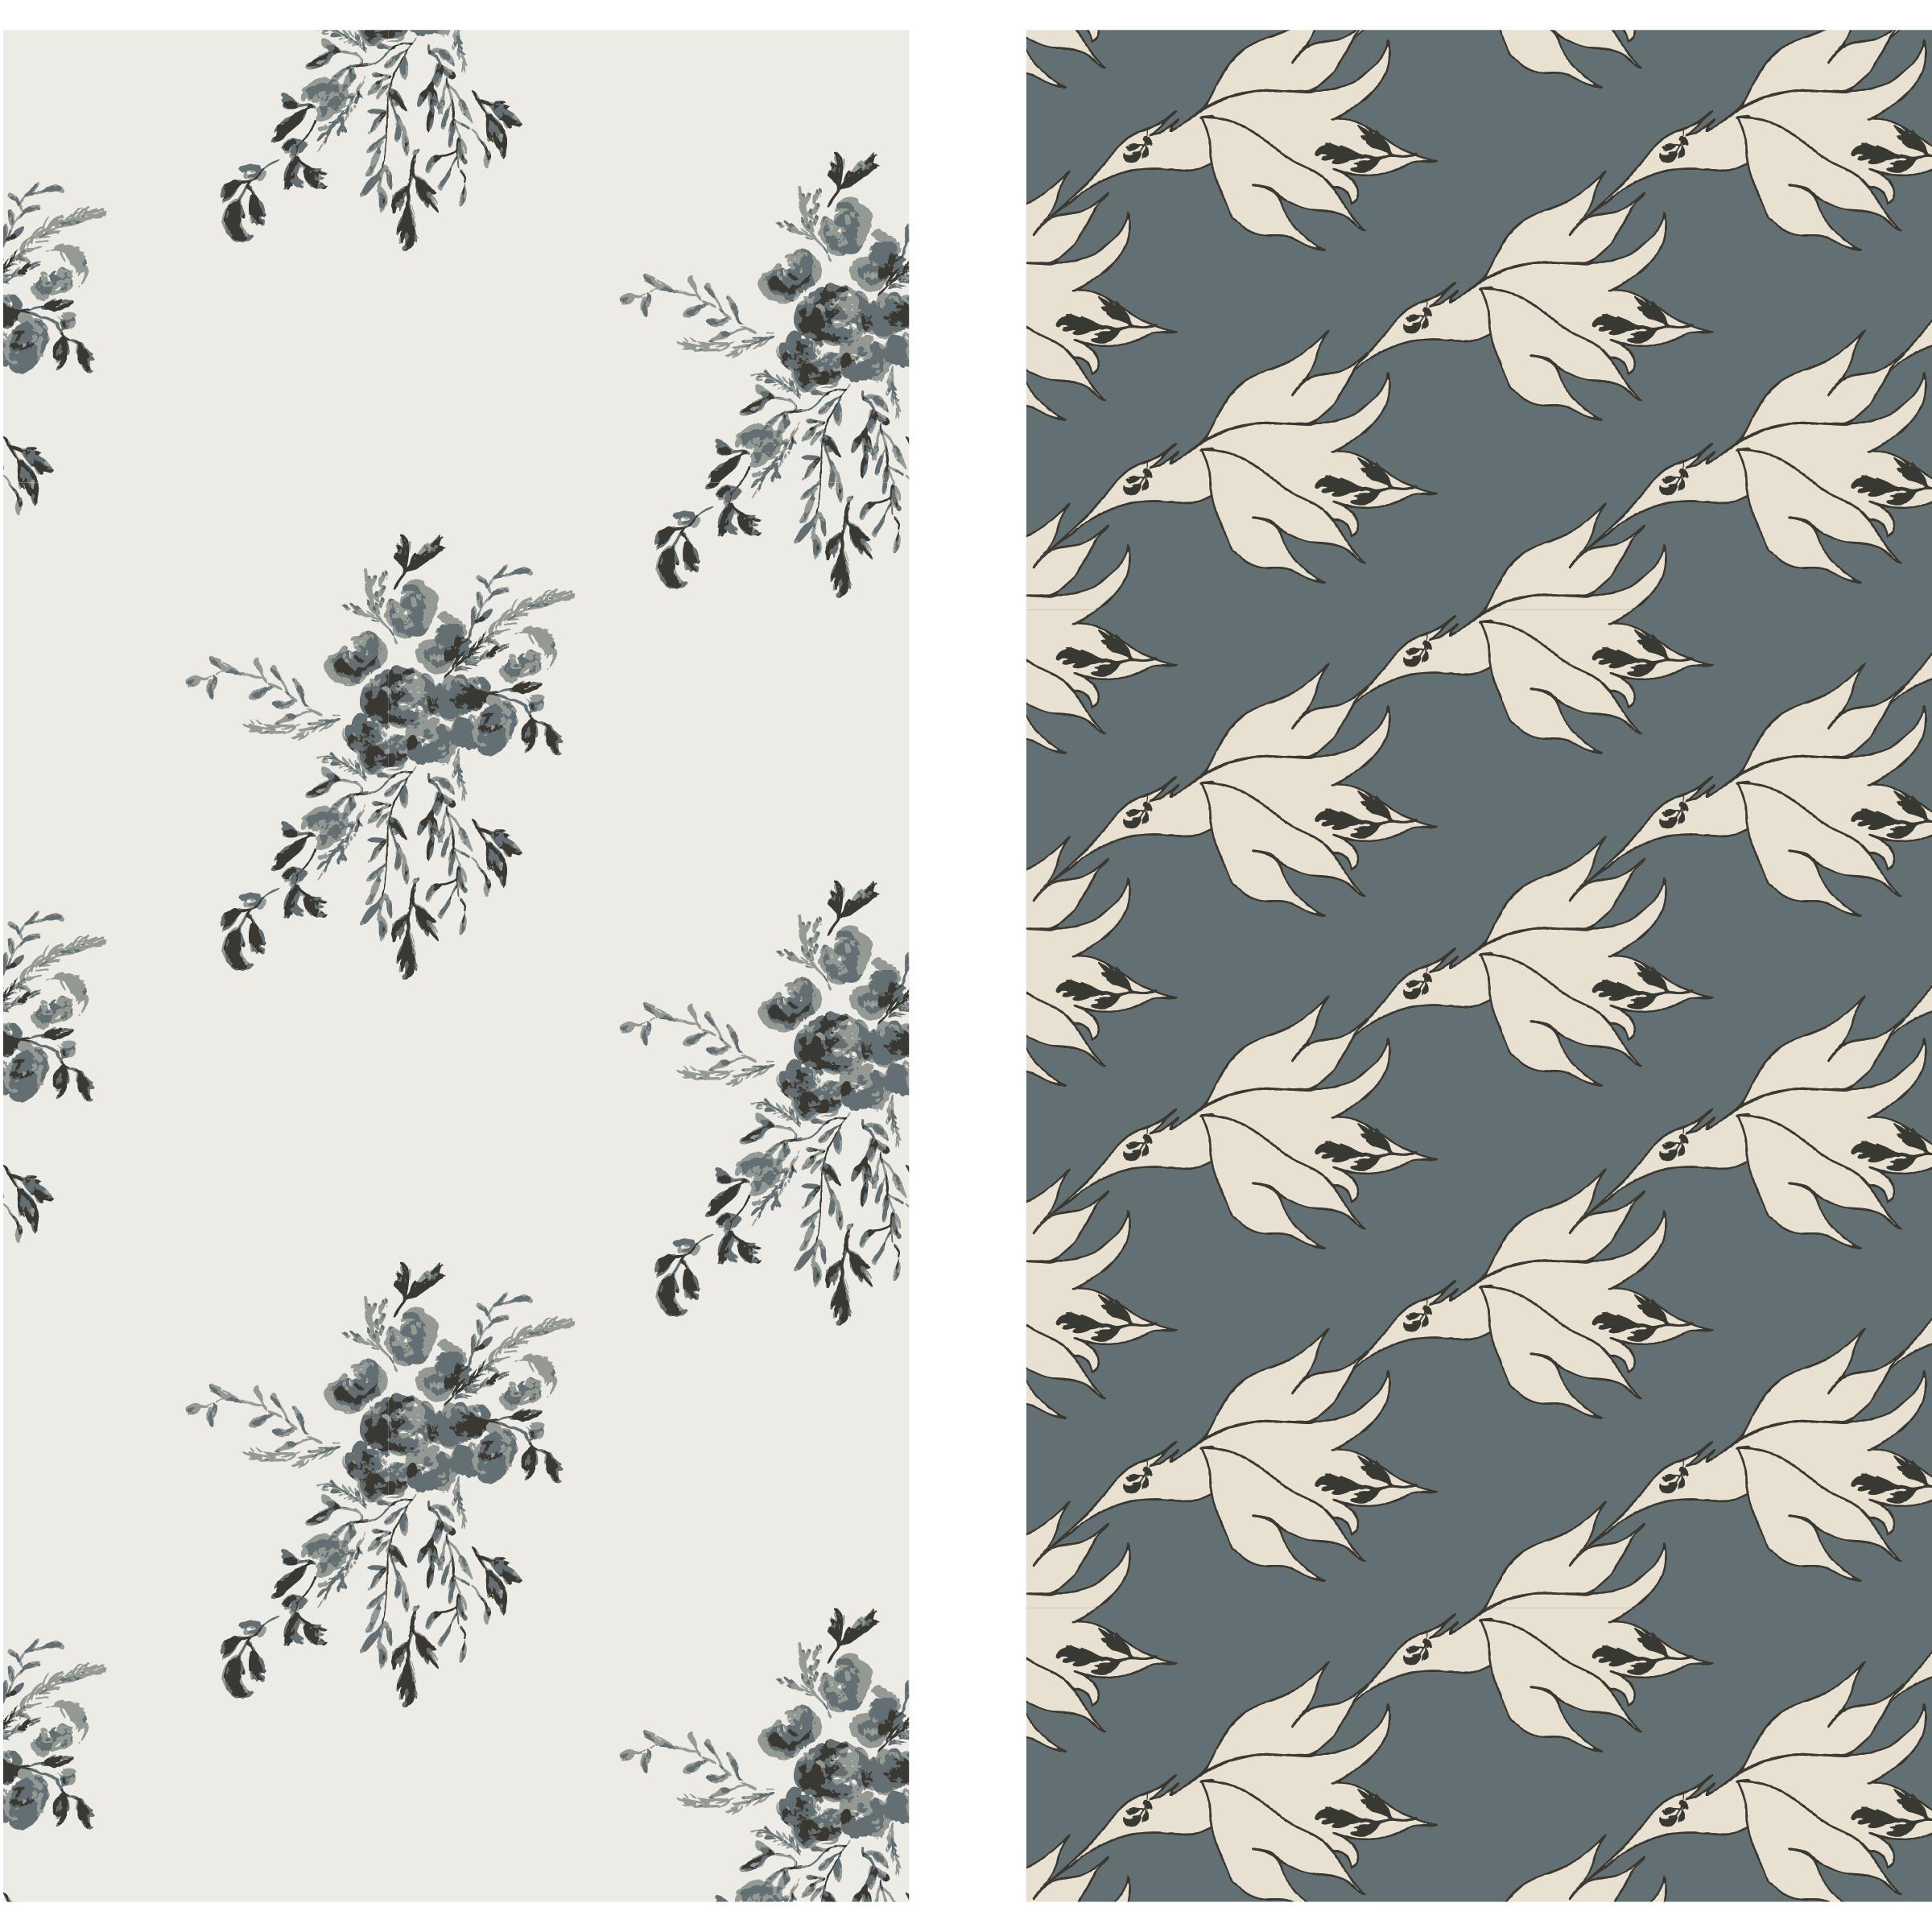 by HOPE johnson surface pattern design_pattern pair.jpg